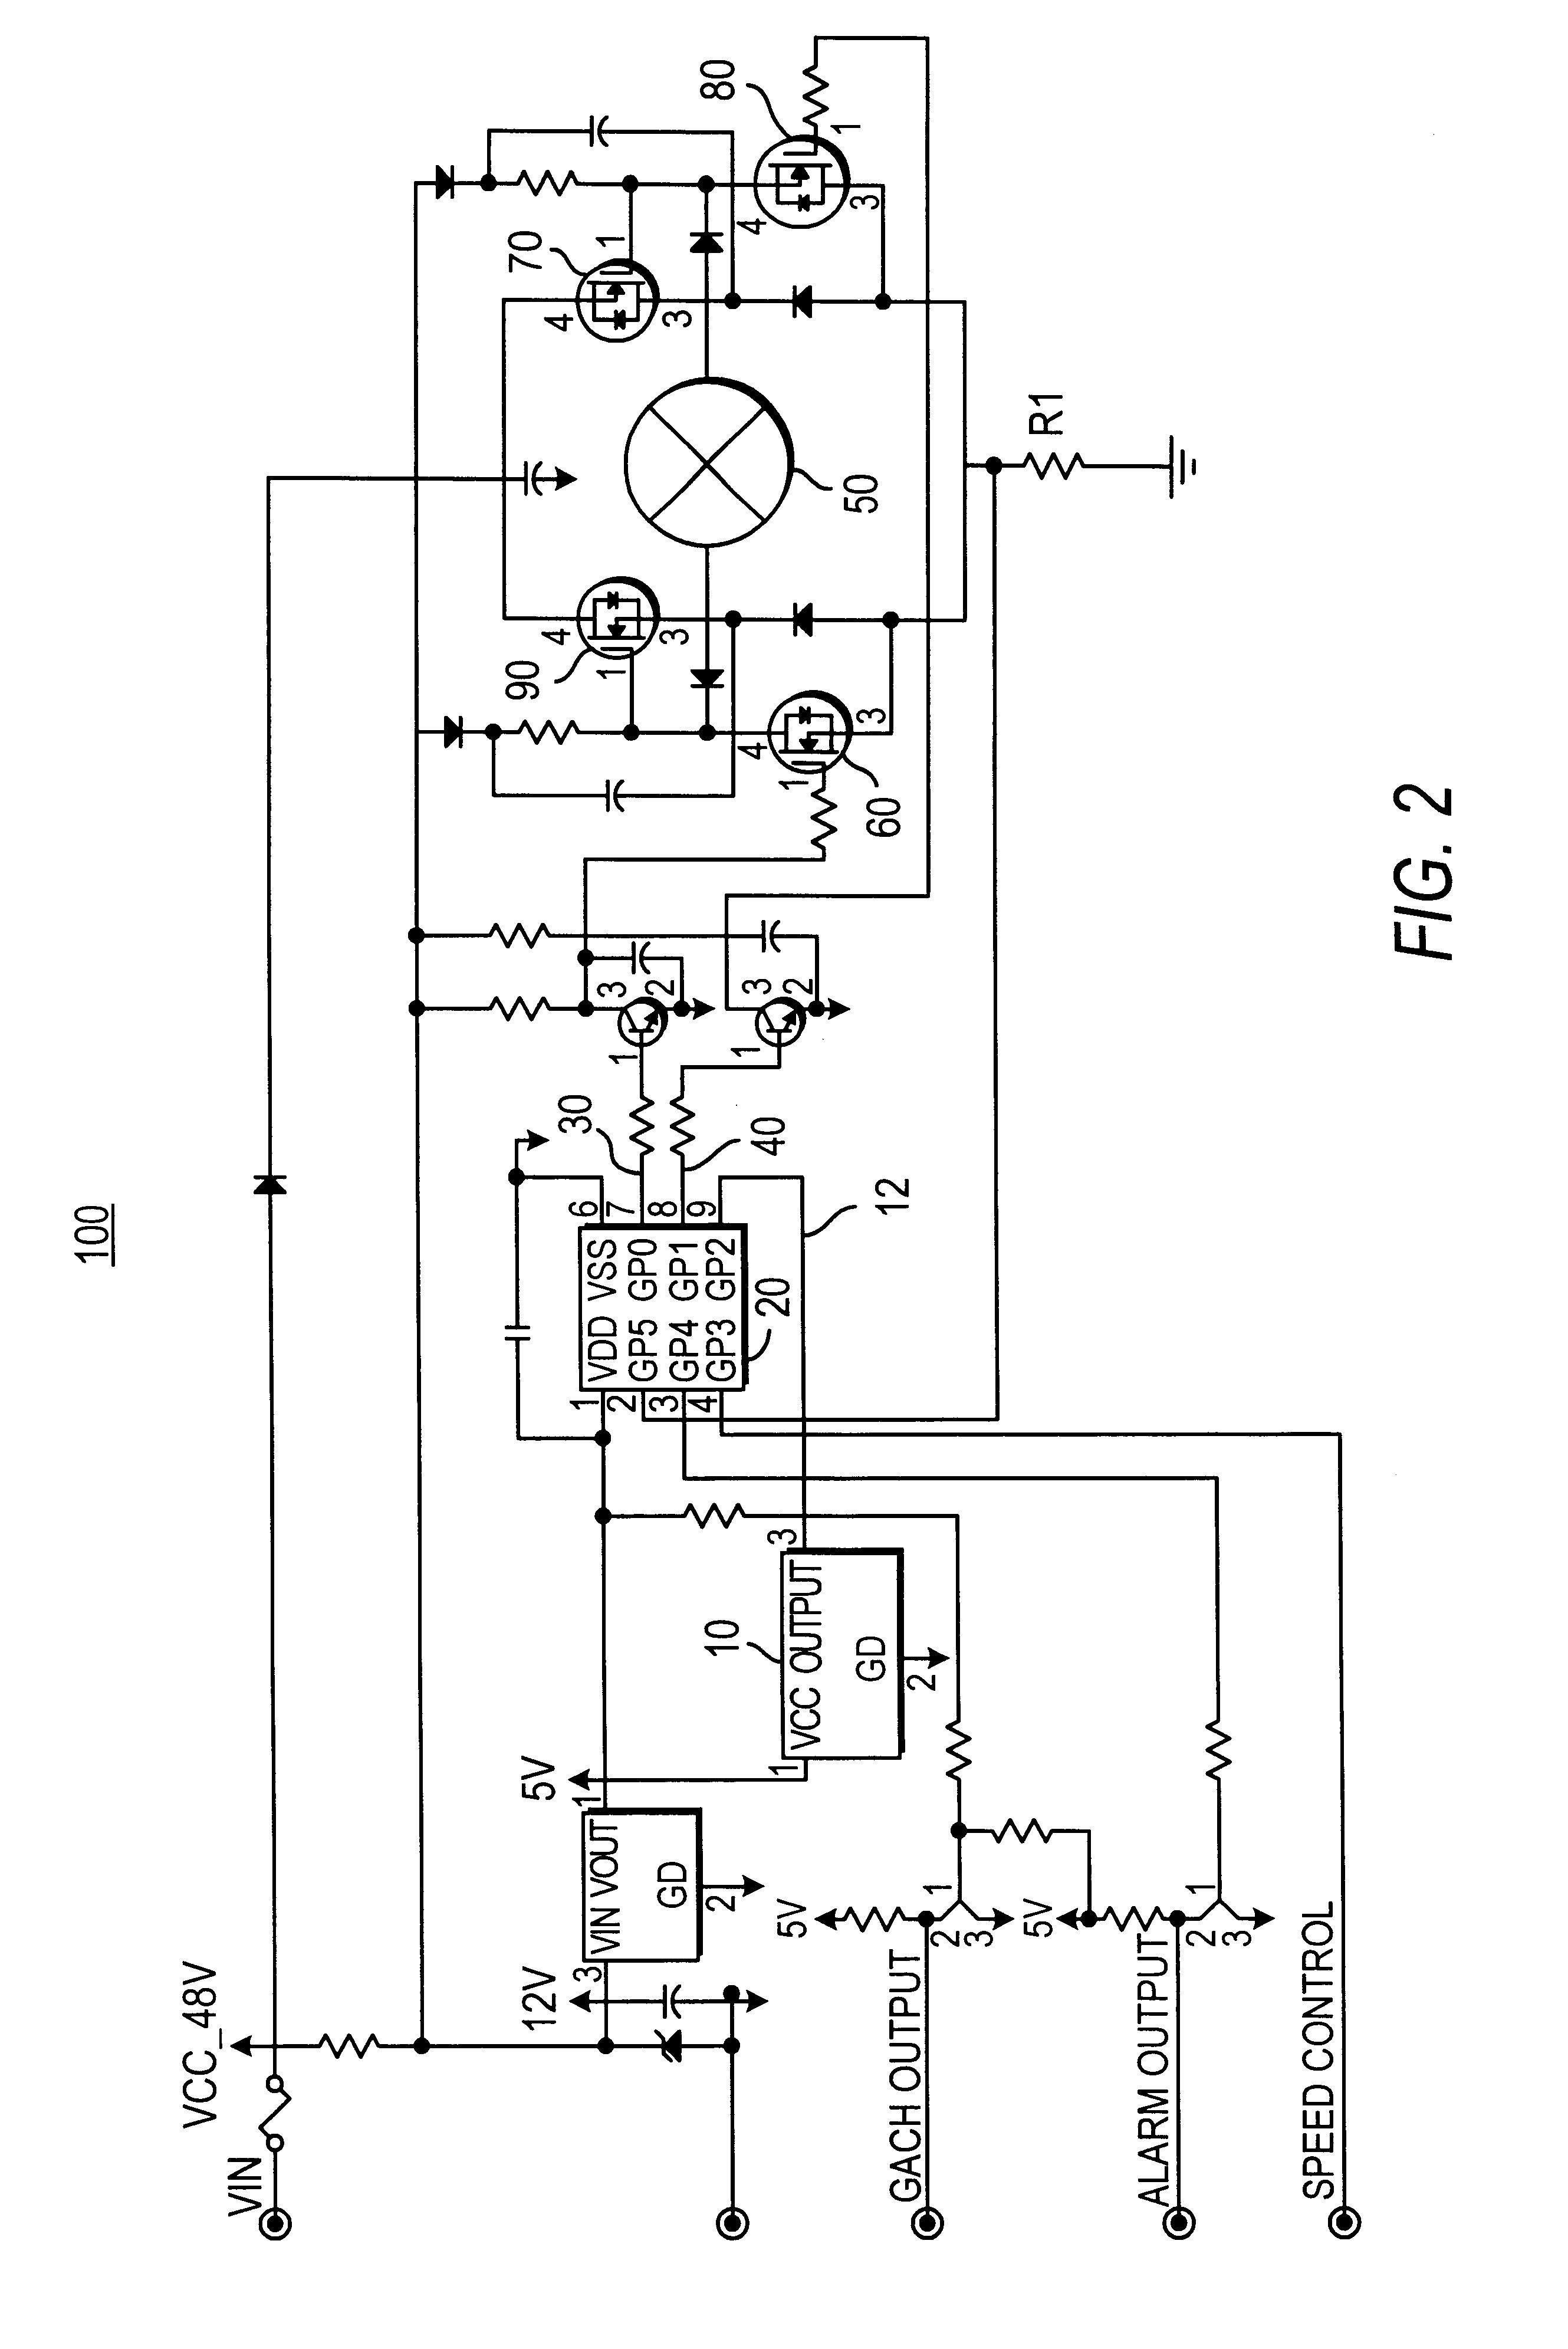 motor starter wiring diagram Collection-Wiring Diagram Practice Simple Magnetic Starter Diagram Beautiful Cutler Hammer Motor Starter 3-e